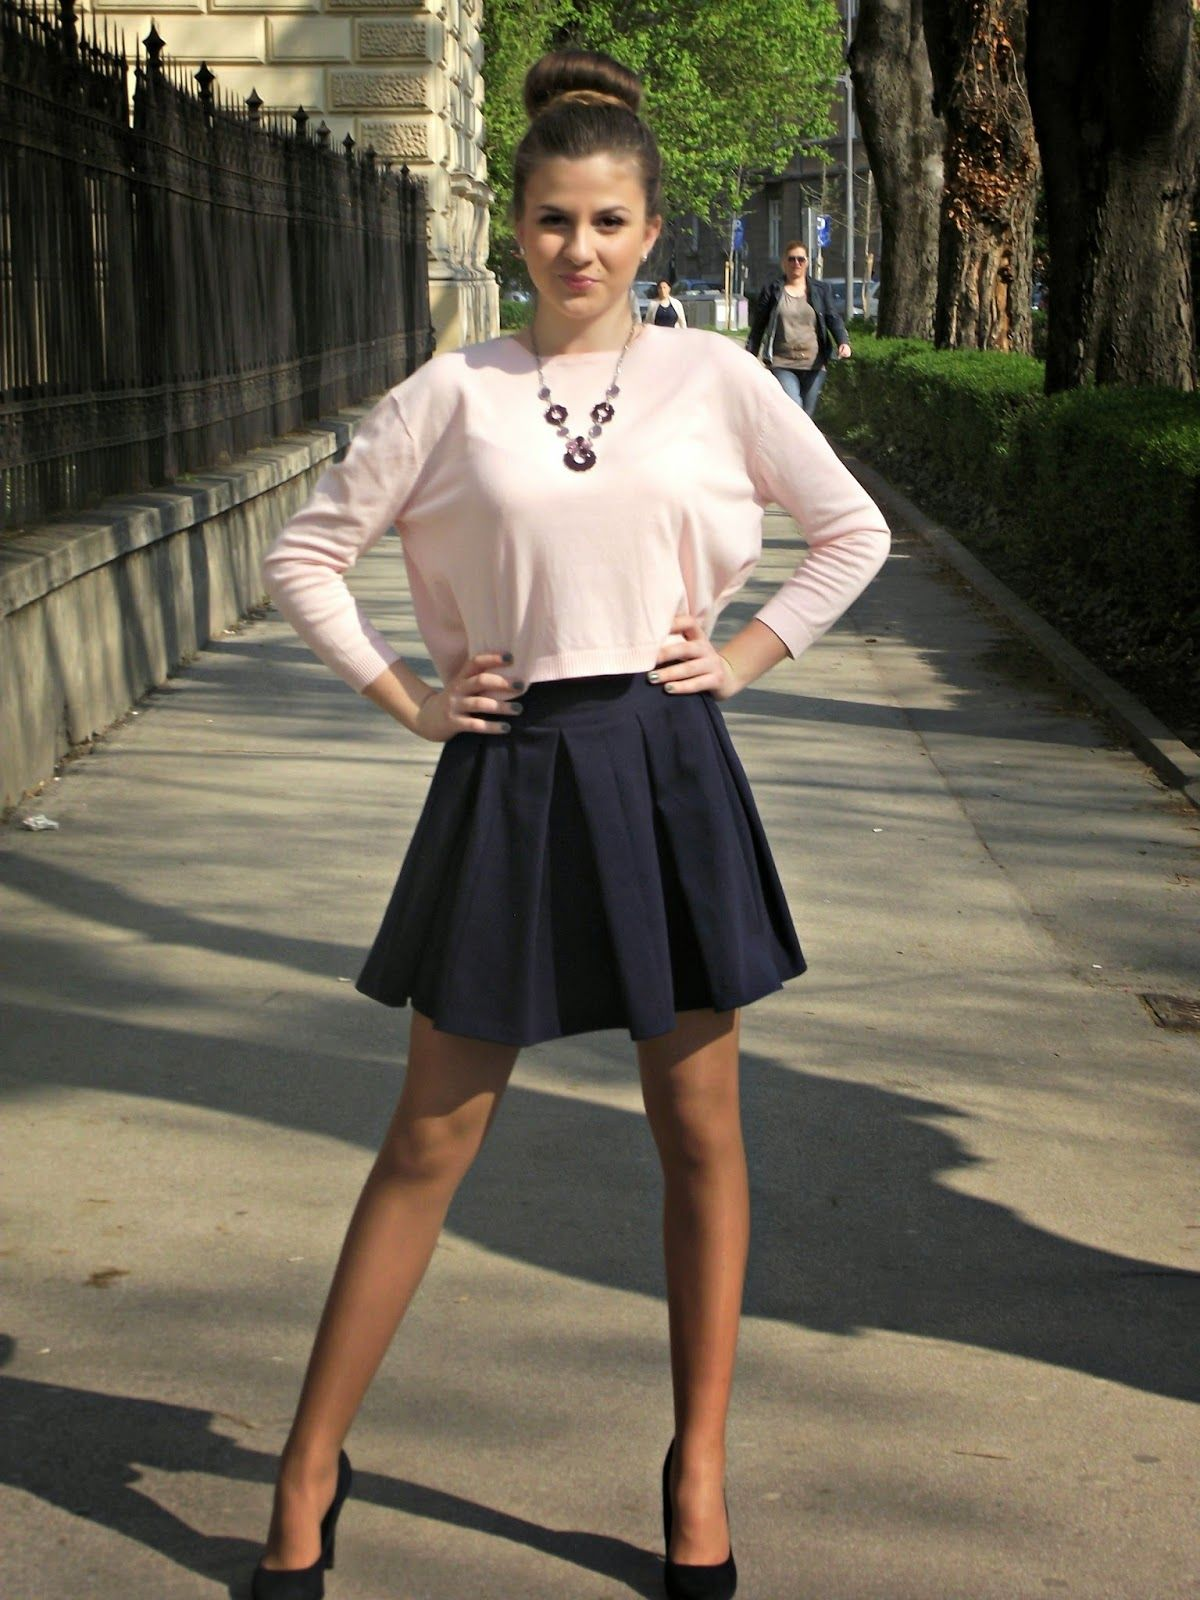 Viva la fashion #tan #pantyhose #legs #blogger | Blogger Outfit 2 ...